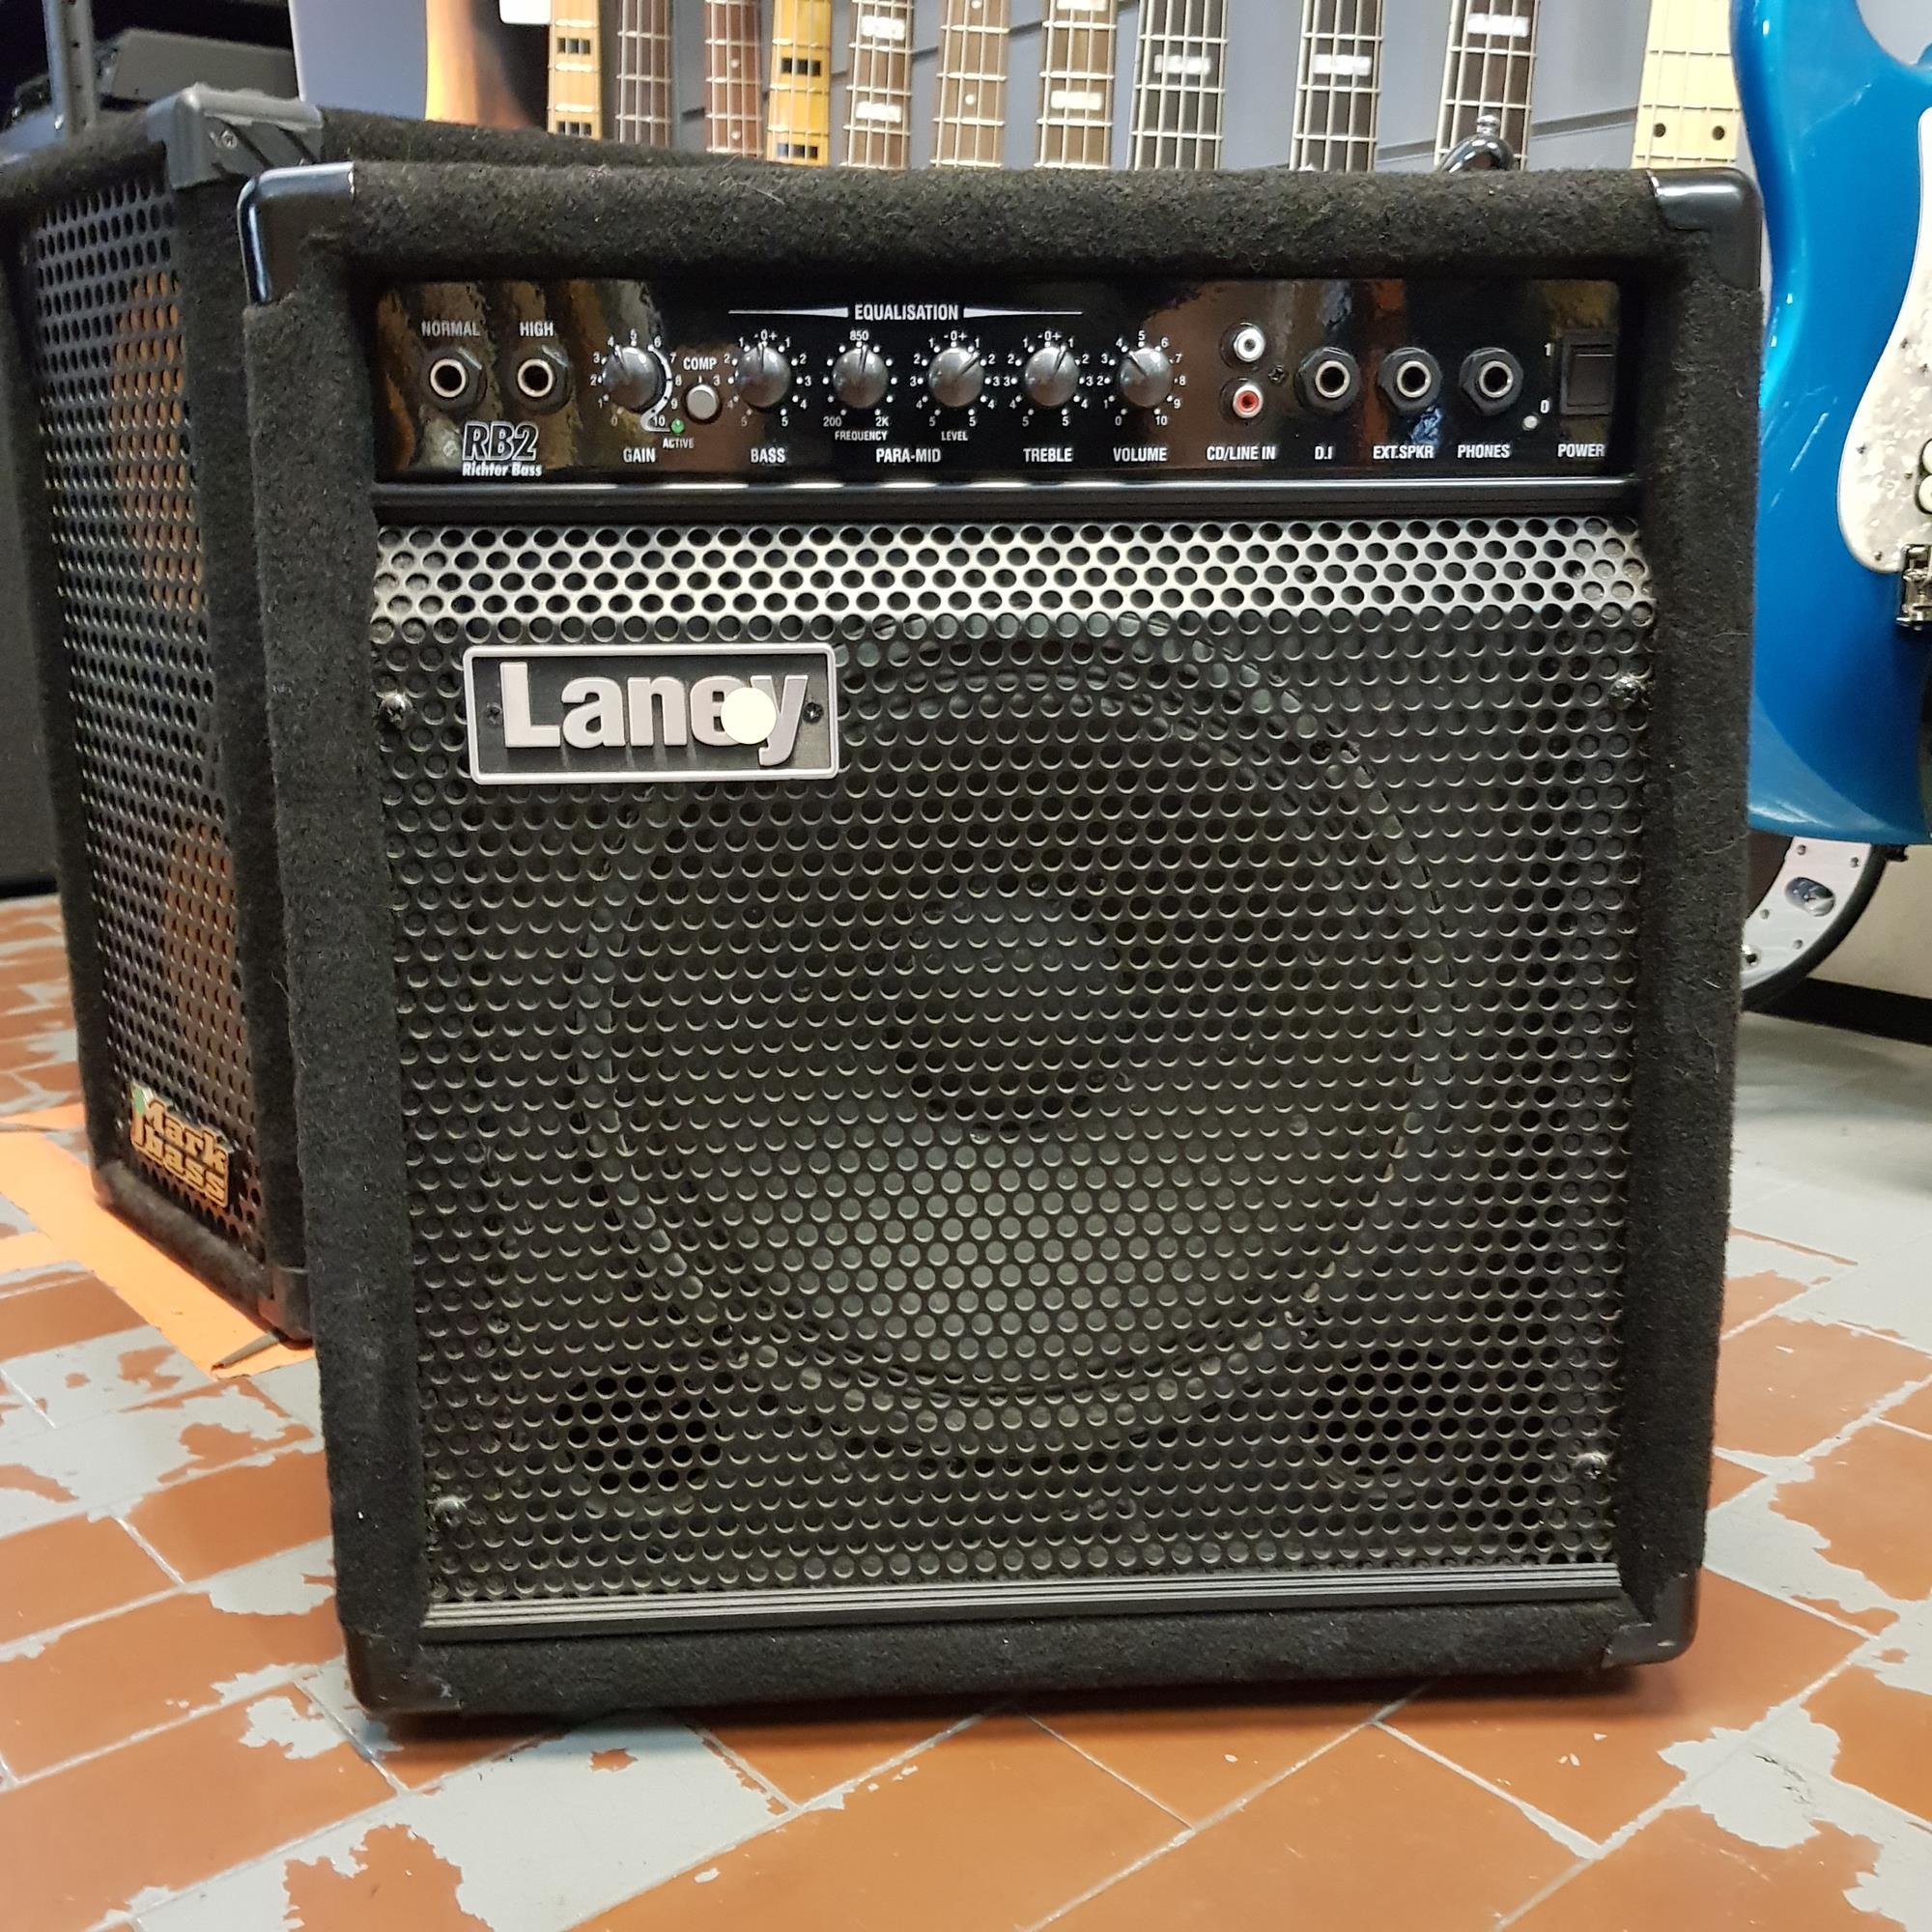 LANEY-RB-2-BASS-COMBO-sku-1622890718774